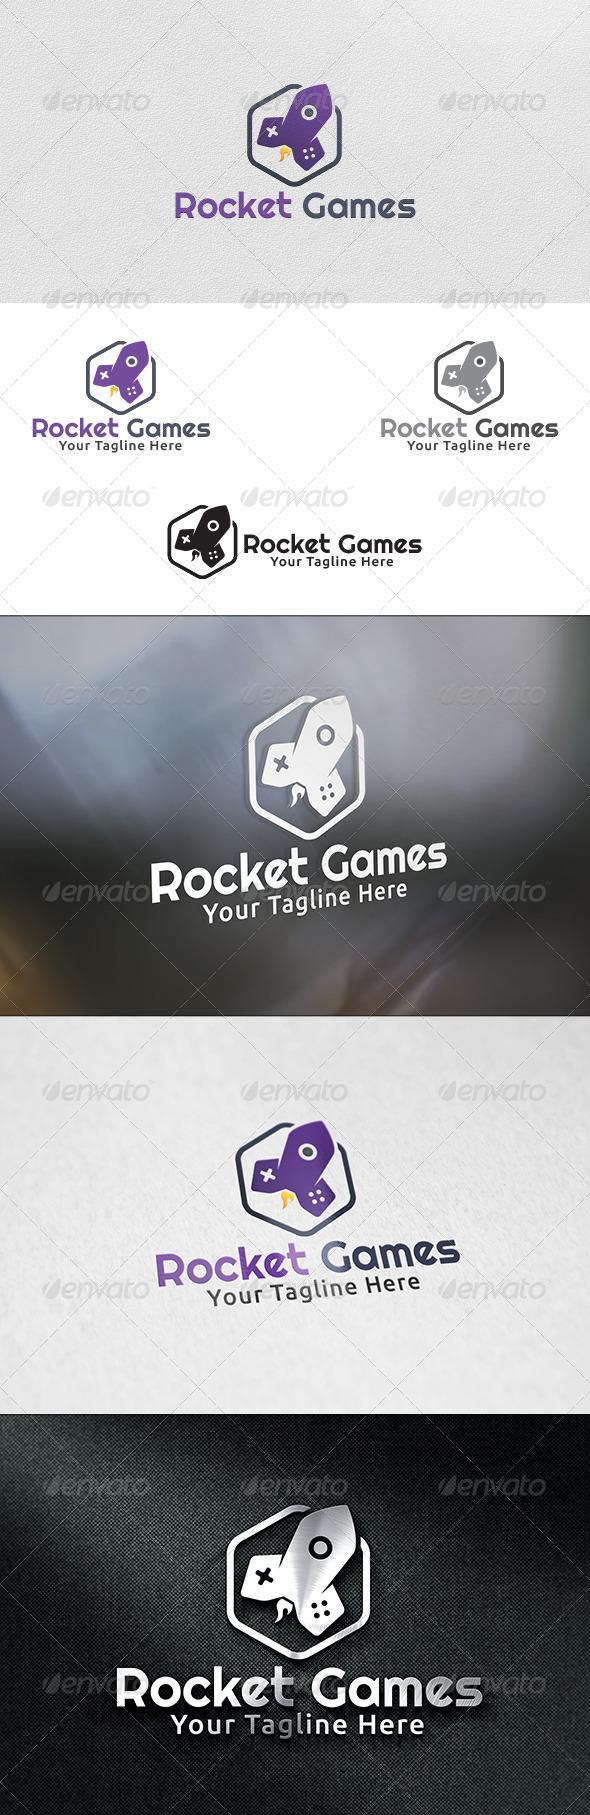 Rocket Games - Logo Template - Objects Logo Templates